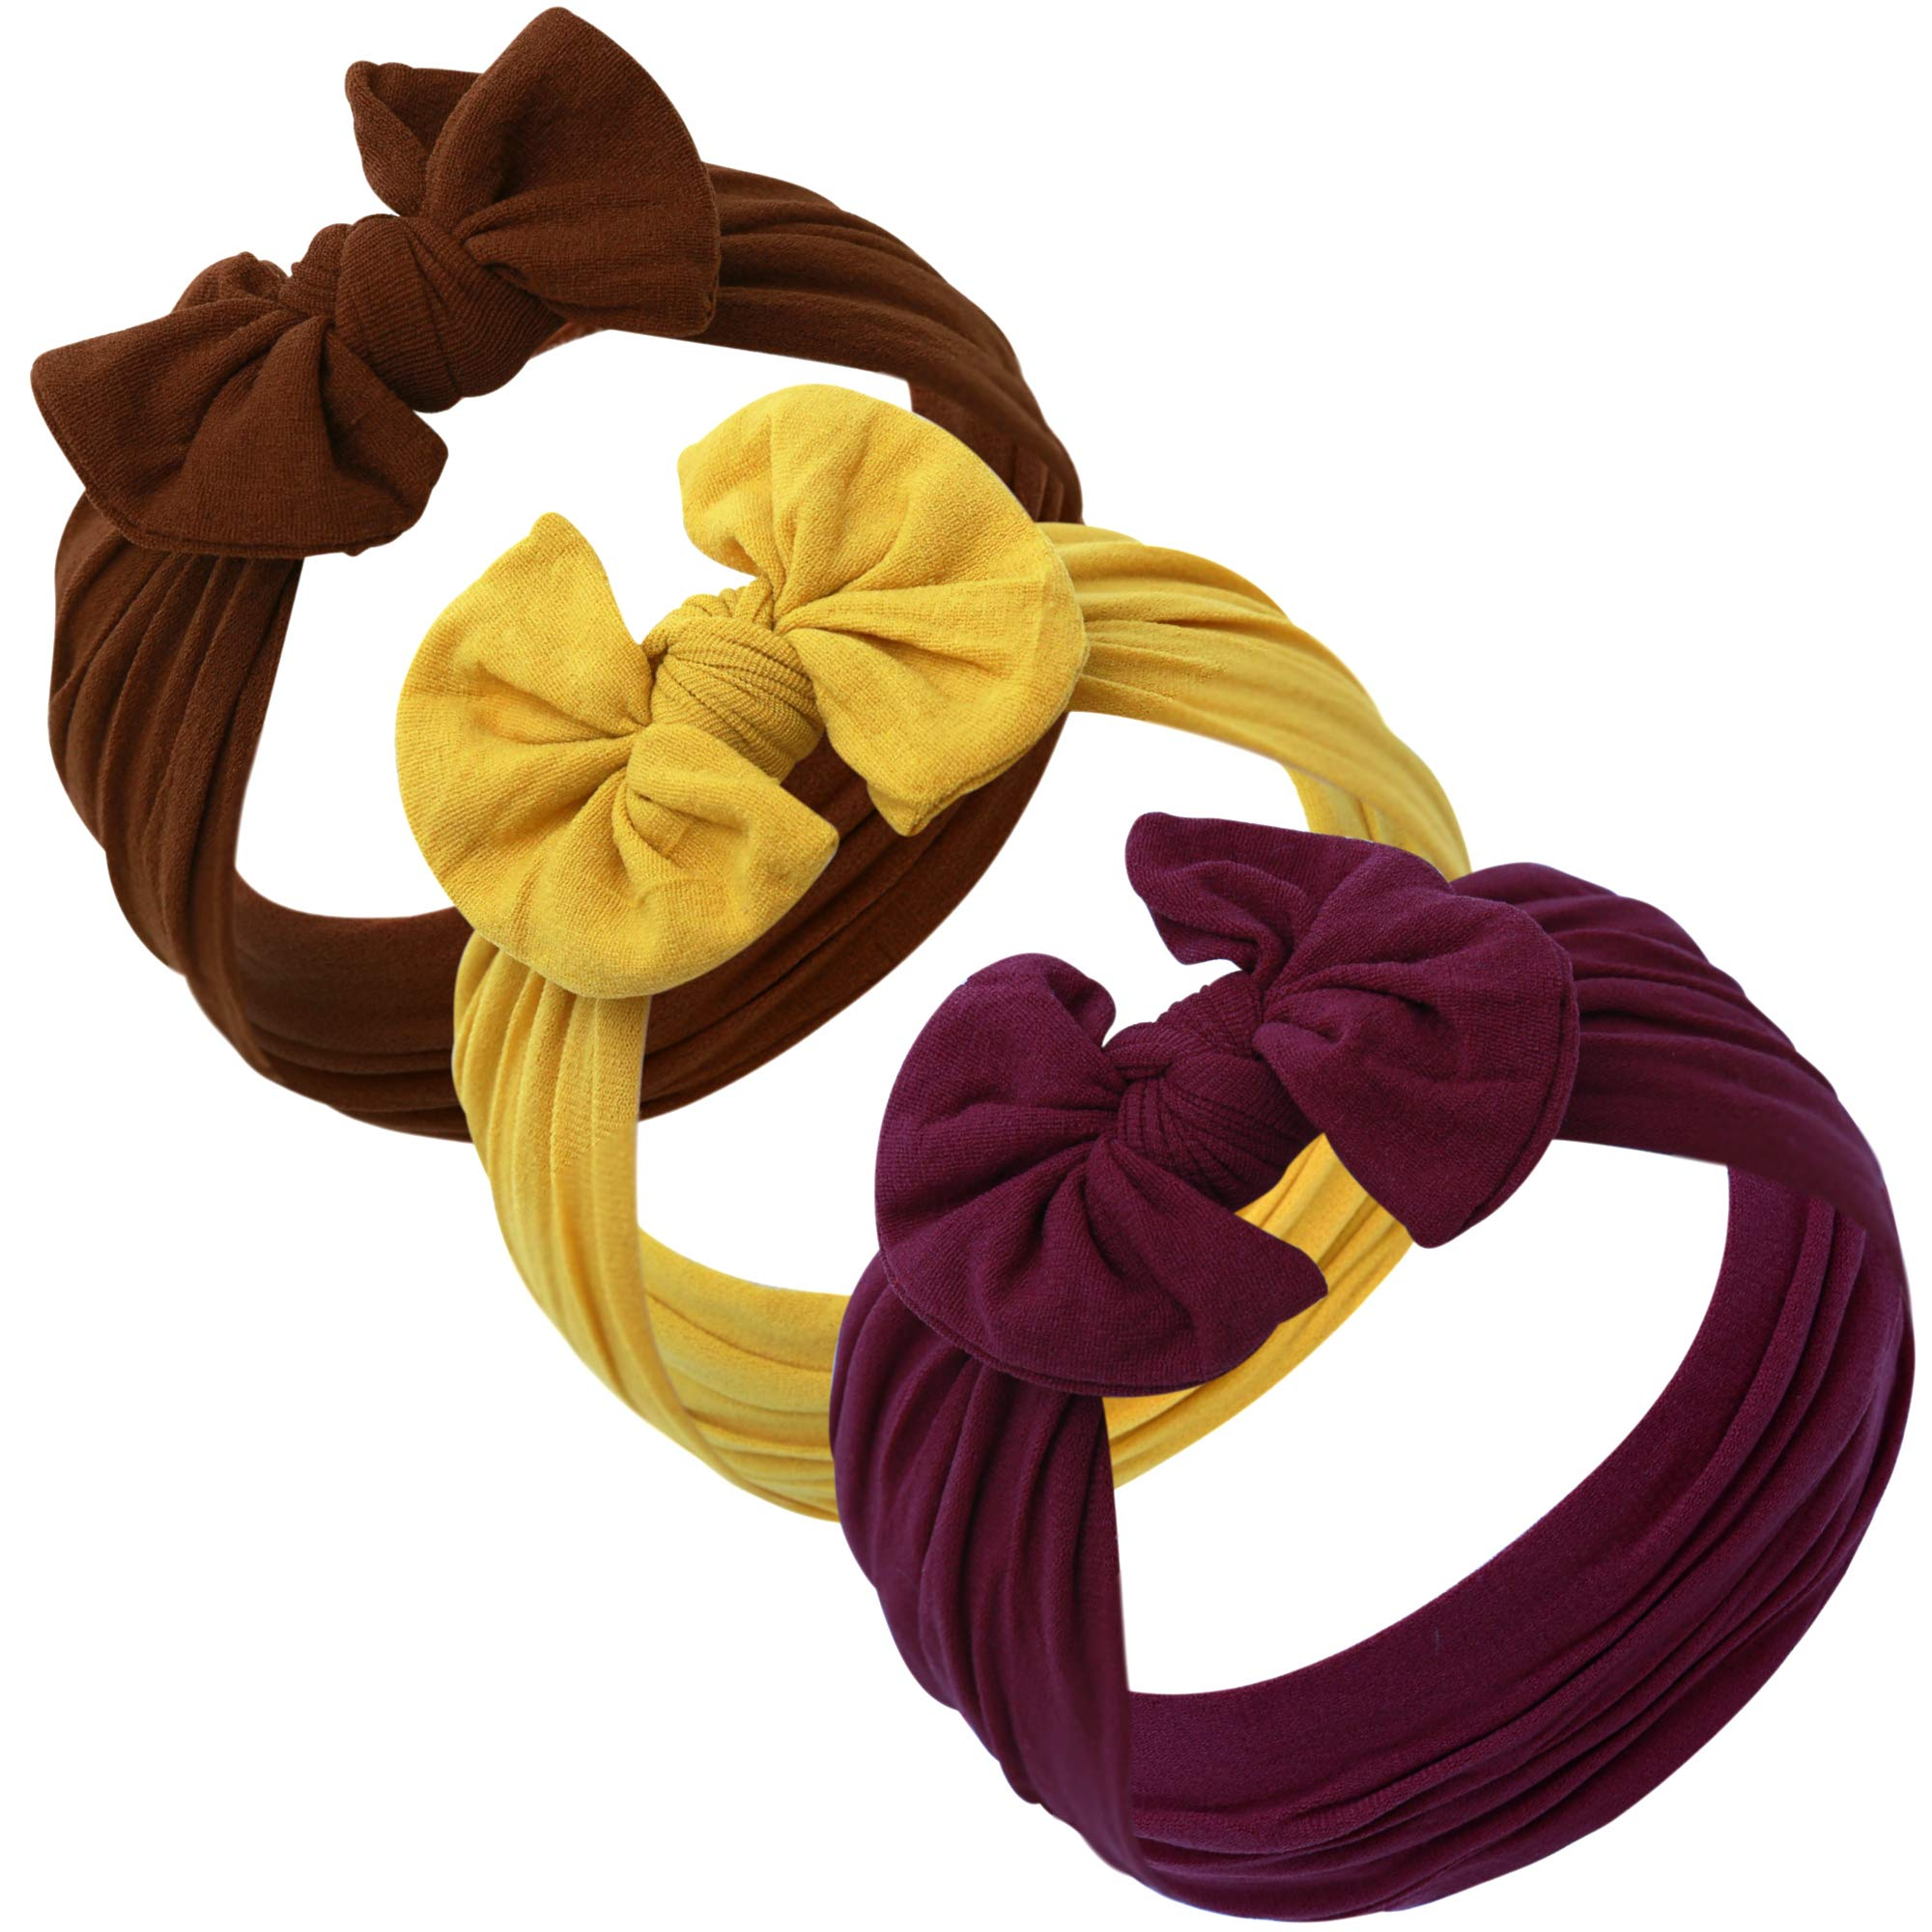 Baby Girl Headbands and bows - Nylon Headband Fits newborns toddlers infants girls Fall colors Mustard Burgundy Brown by JLIKA